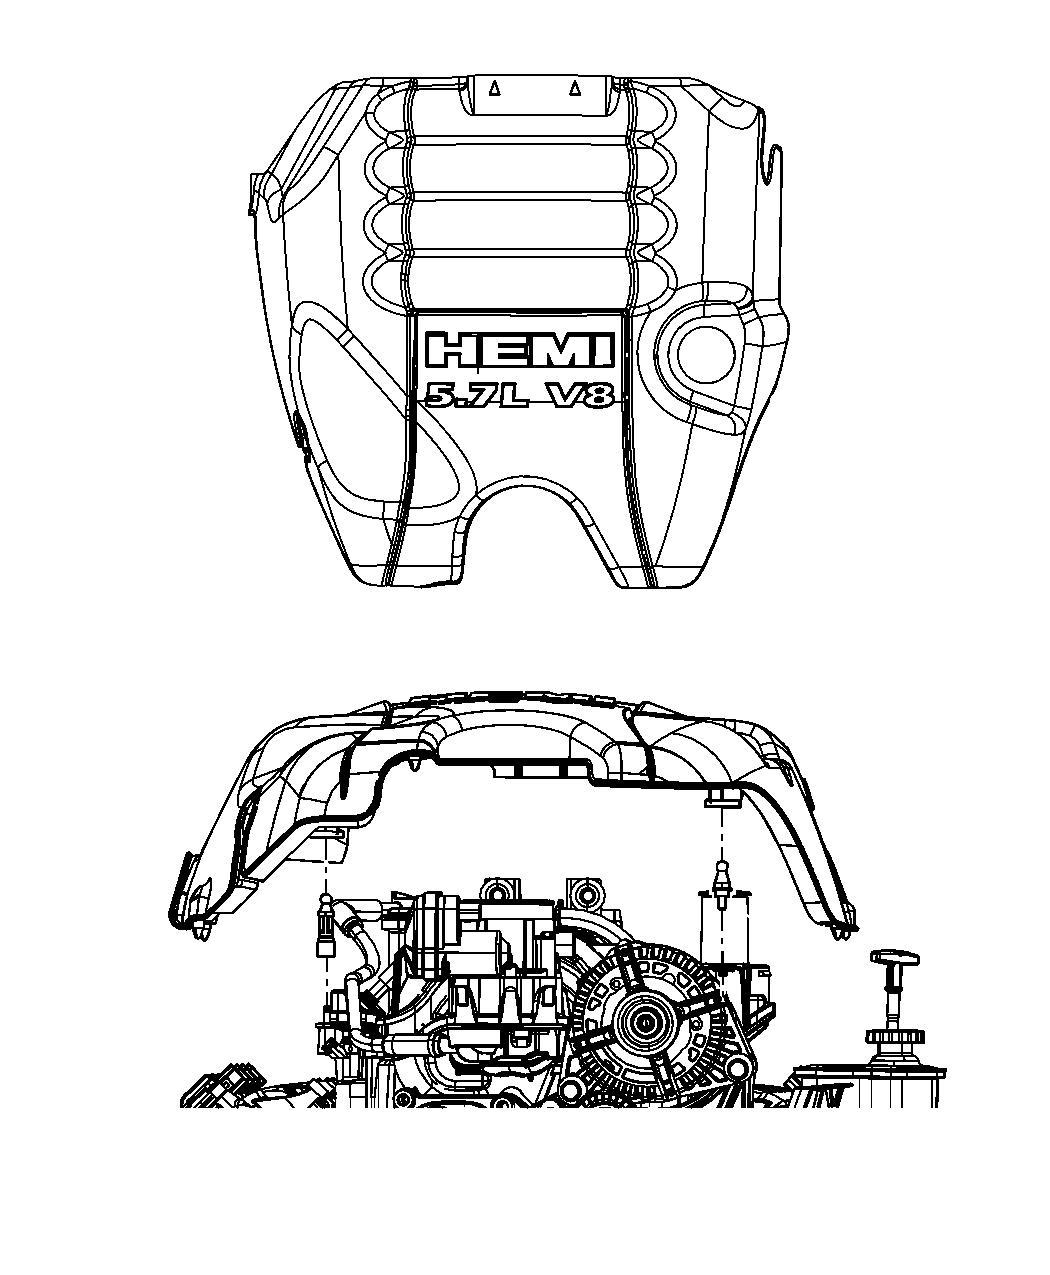 Ram 2500 Cover. Engine. 5.7l, crew cab. Related, ezc